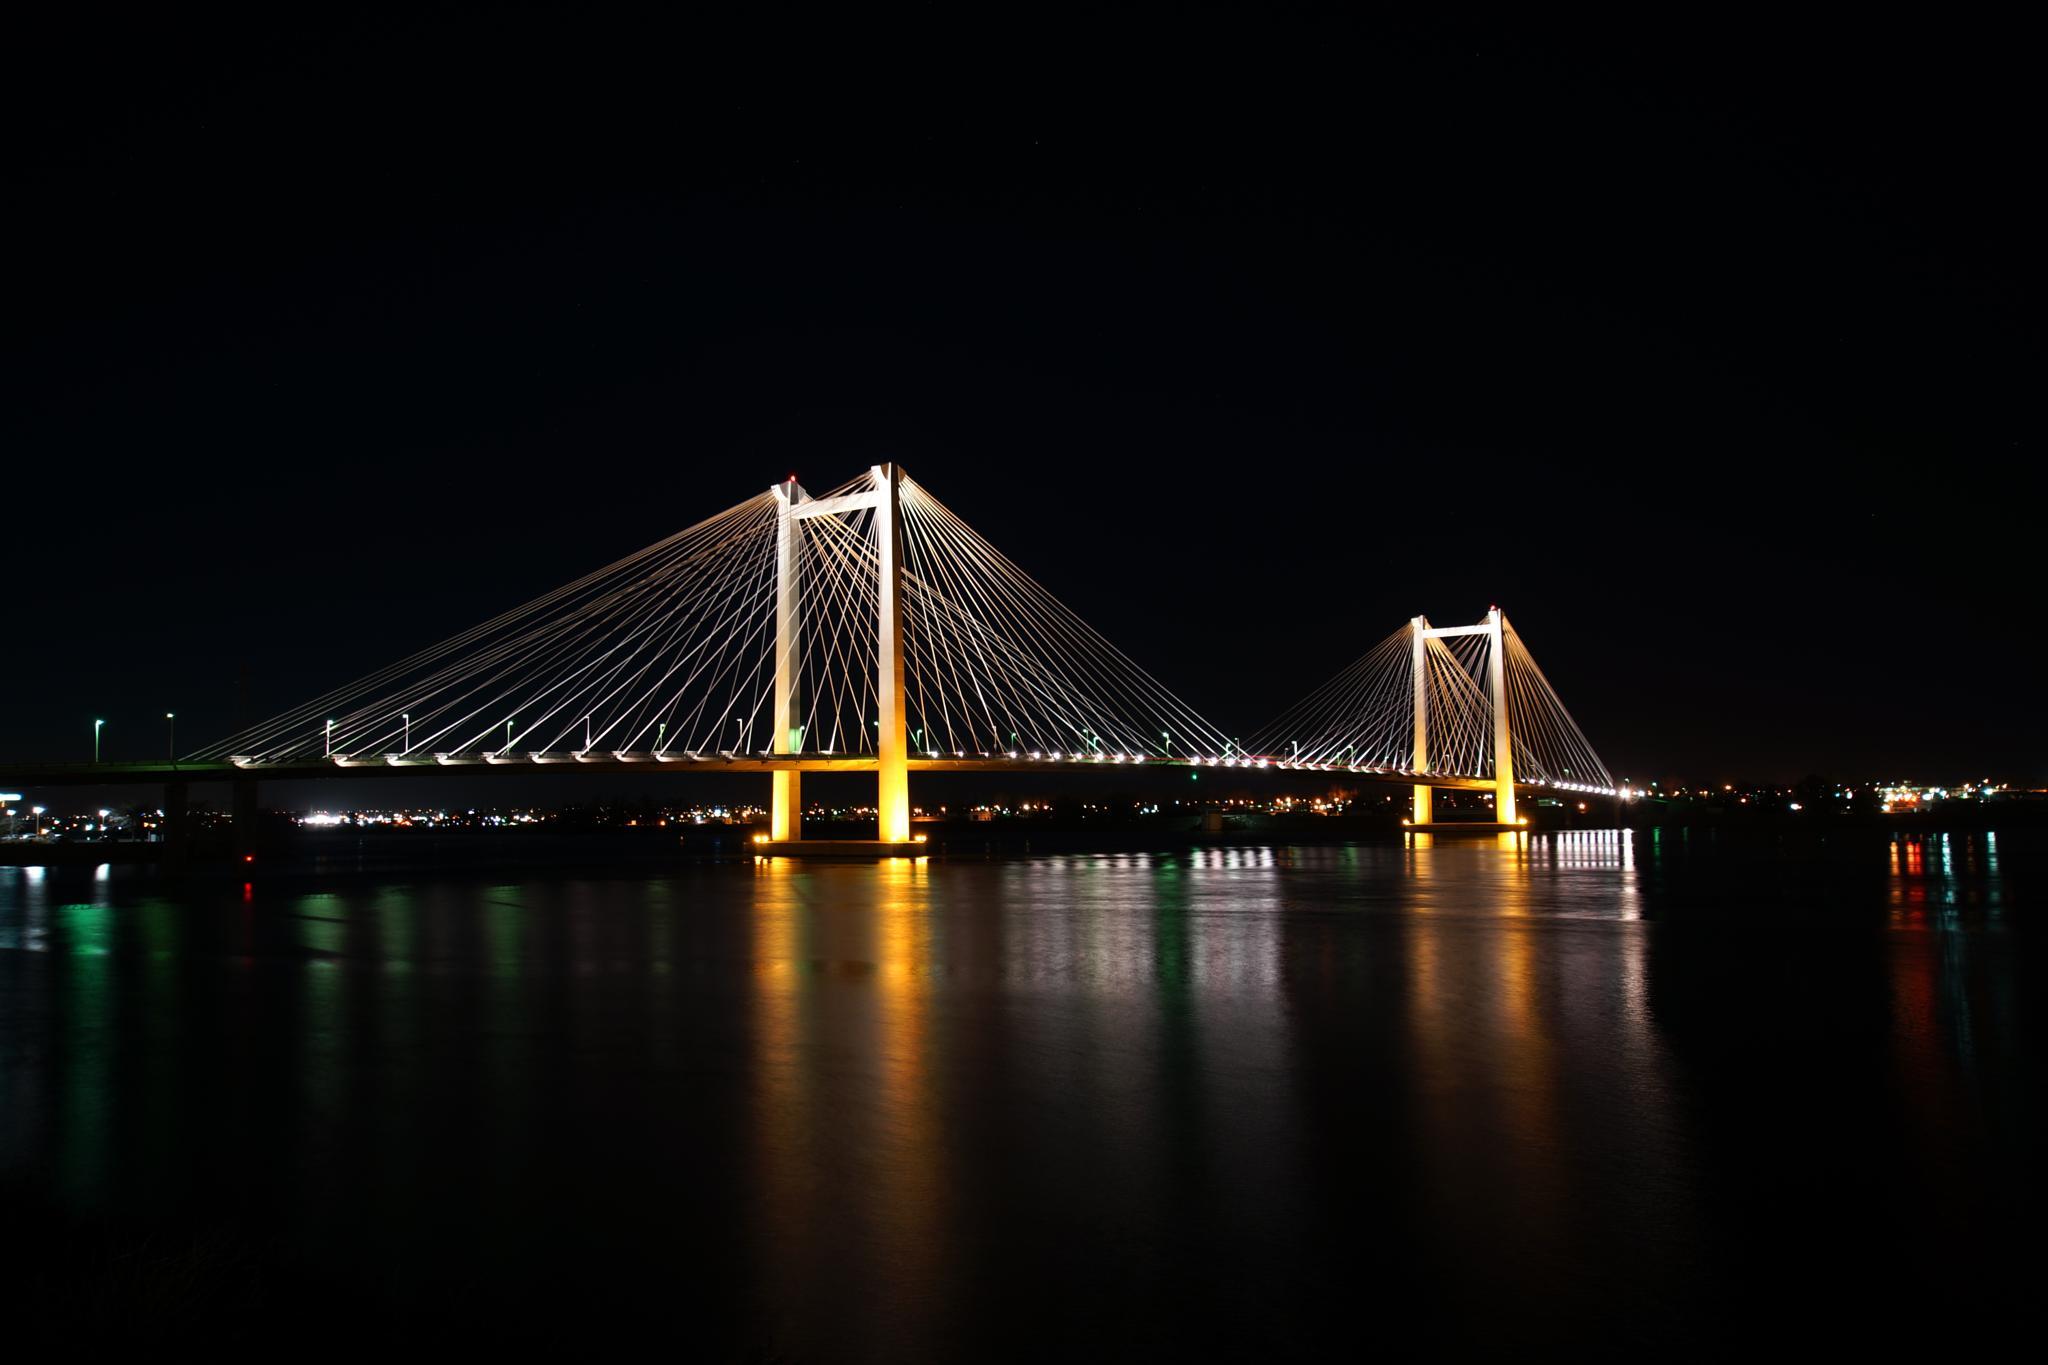 Cable Bridge by Ranbud